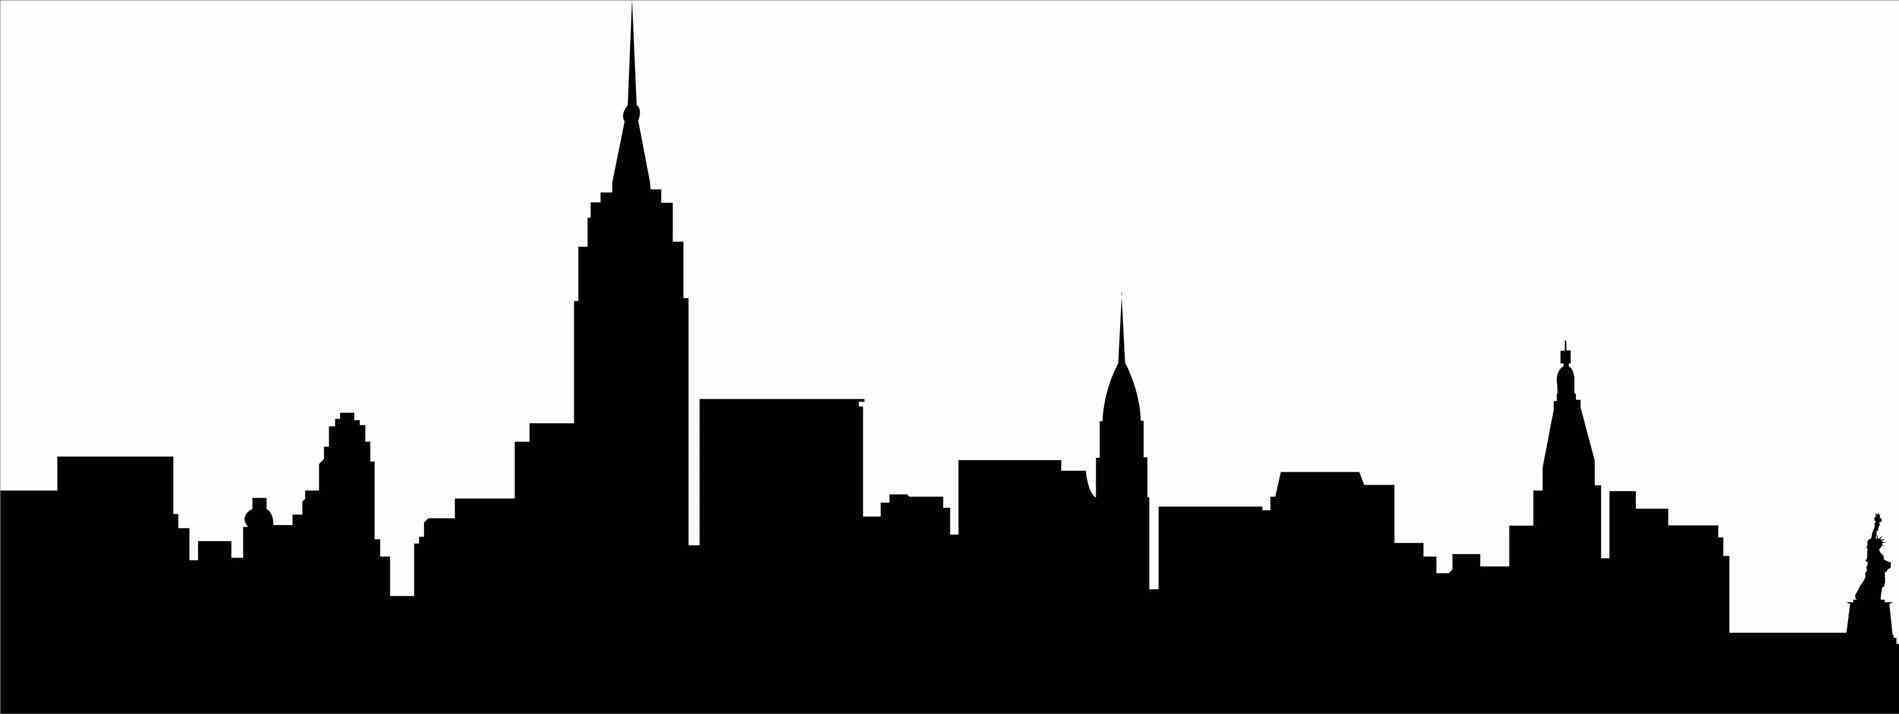 1899x714 Sl Jpg Rhcouk New Nyc Skyline Silhouette 2014 York Black